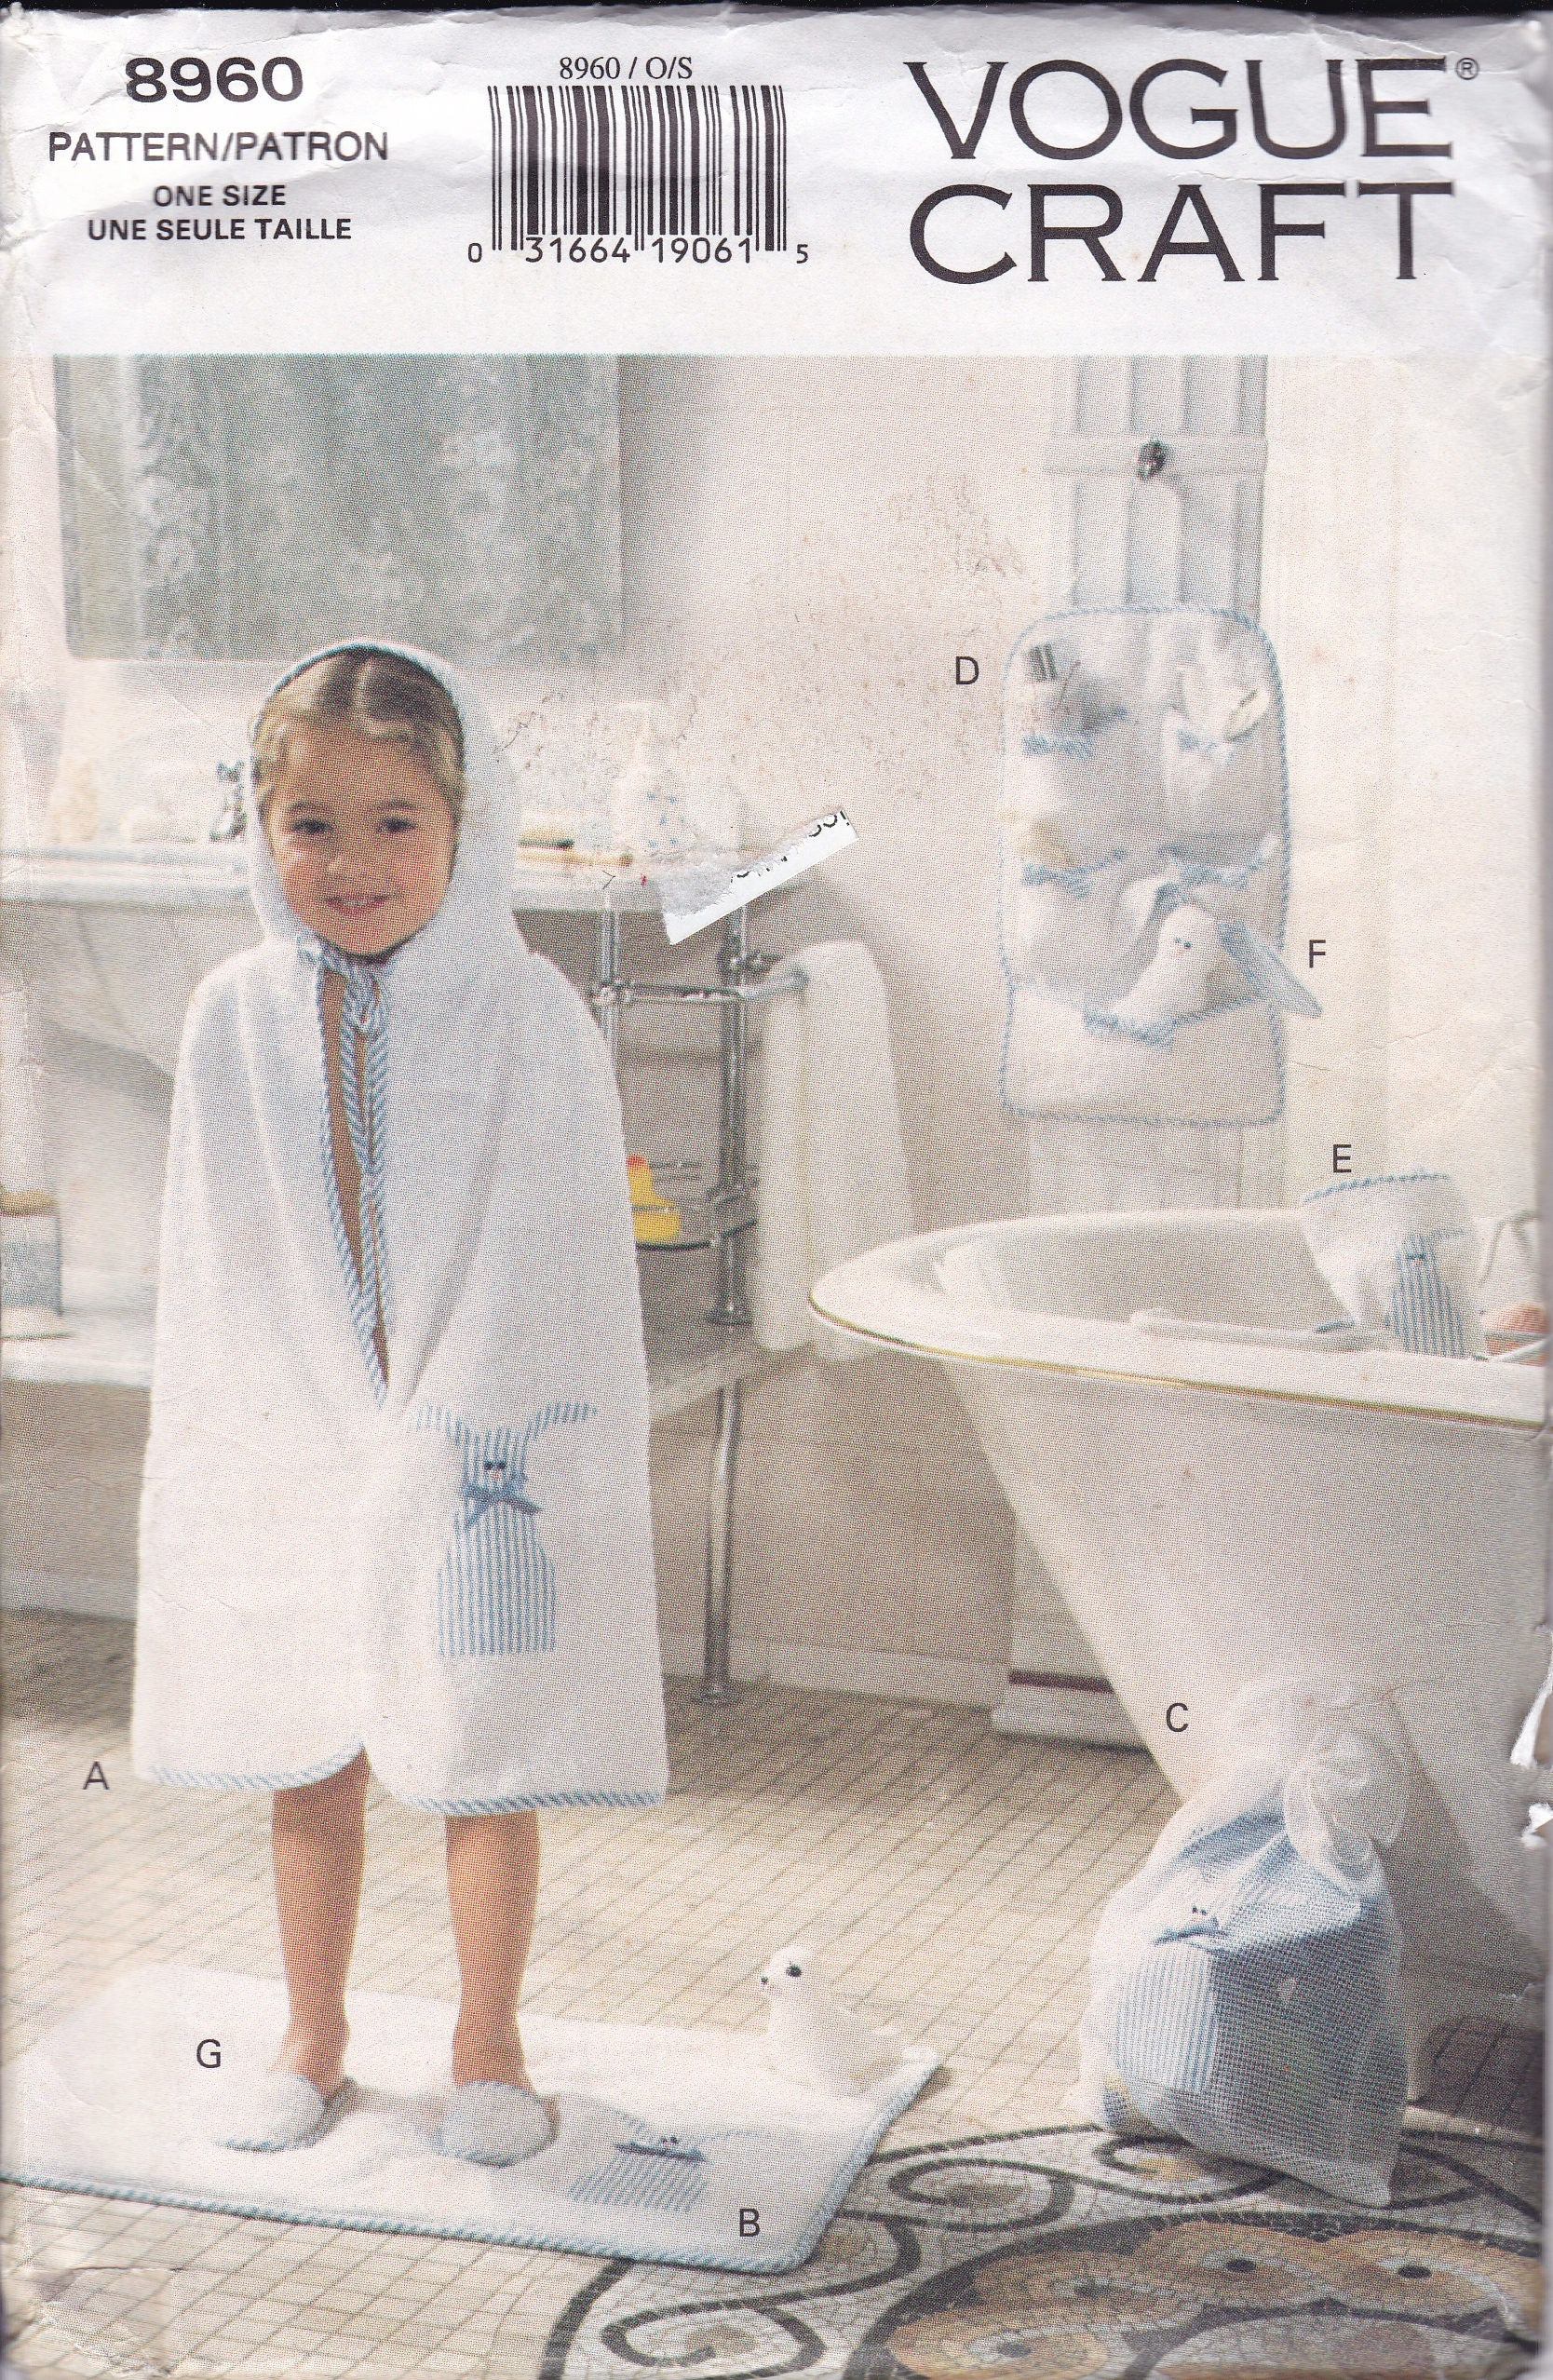 Free us ship vogue 8960 sewing pattern boy girl hooded bath towel free us ship vogue 8960 sewing pattern boy girl hooded bath towel matt wash mitt bag drawstring organizer for toys uncut retro 1990s 90s jeuxipadfo Choice Image